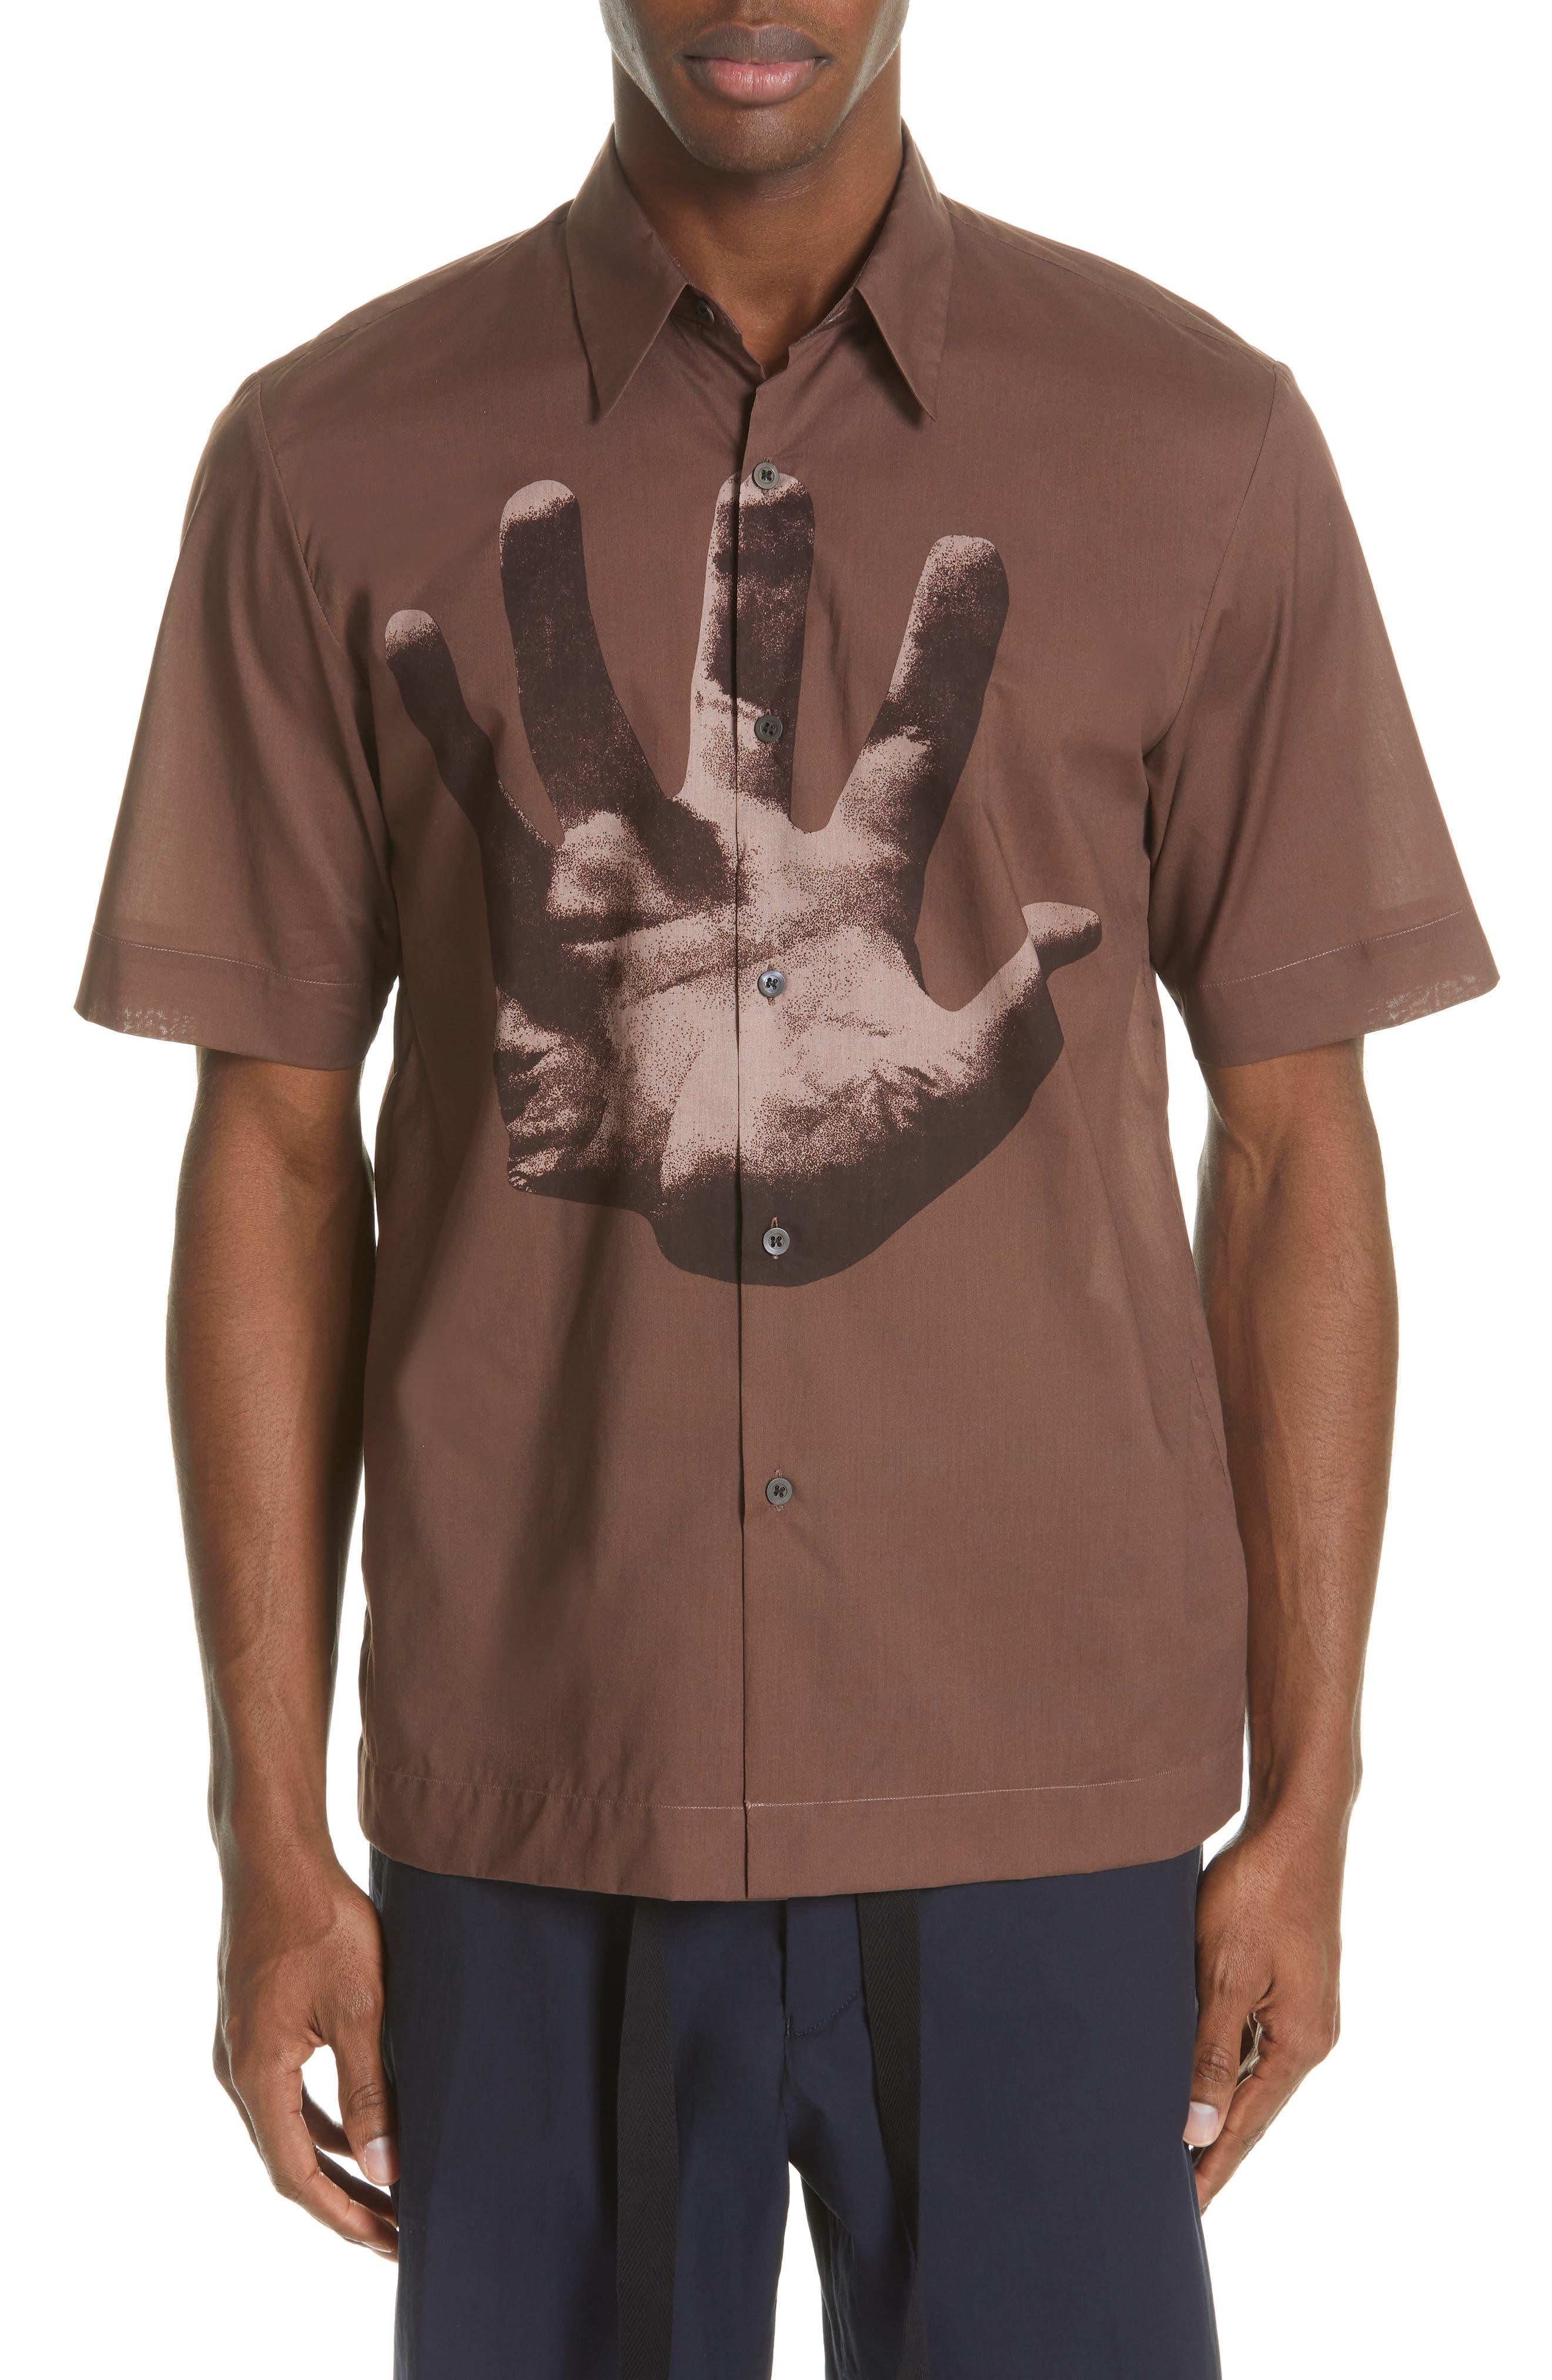 DRIES VAN NOTEN, Clasen Hand Print Shirt, Main thumbnail 1, color, BROWN